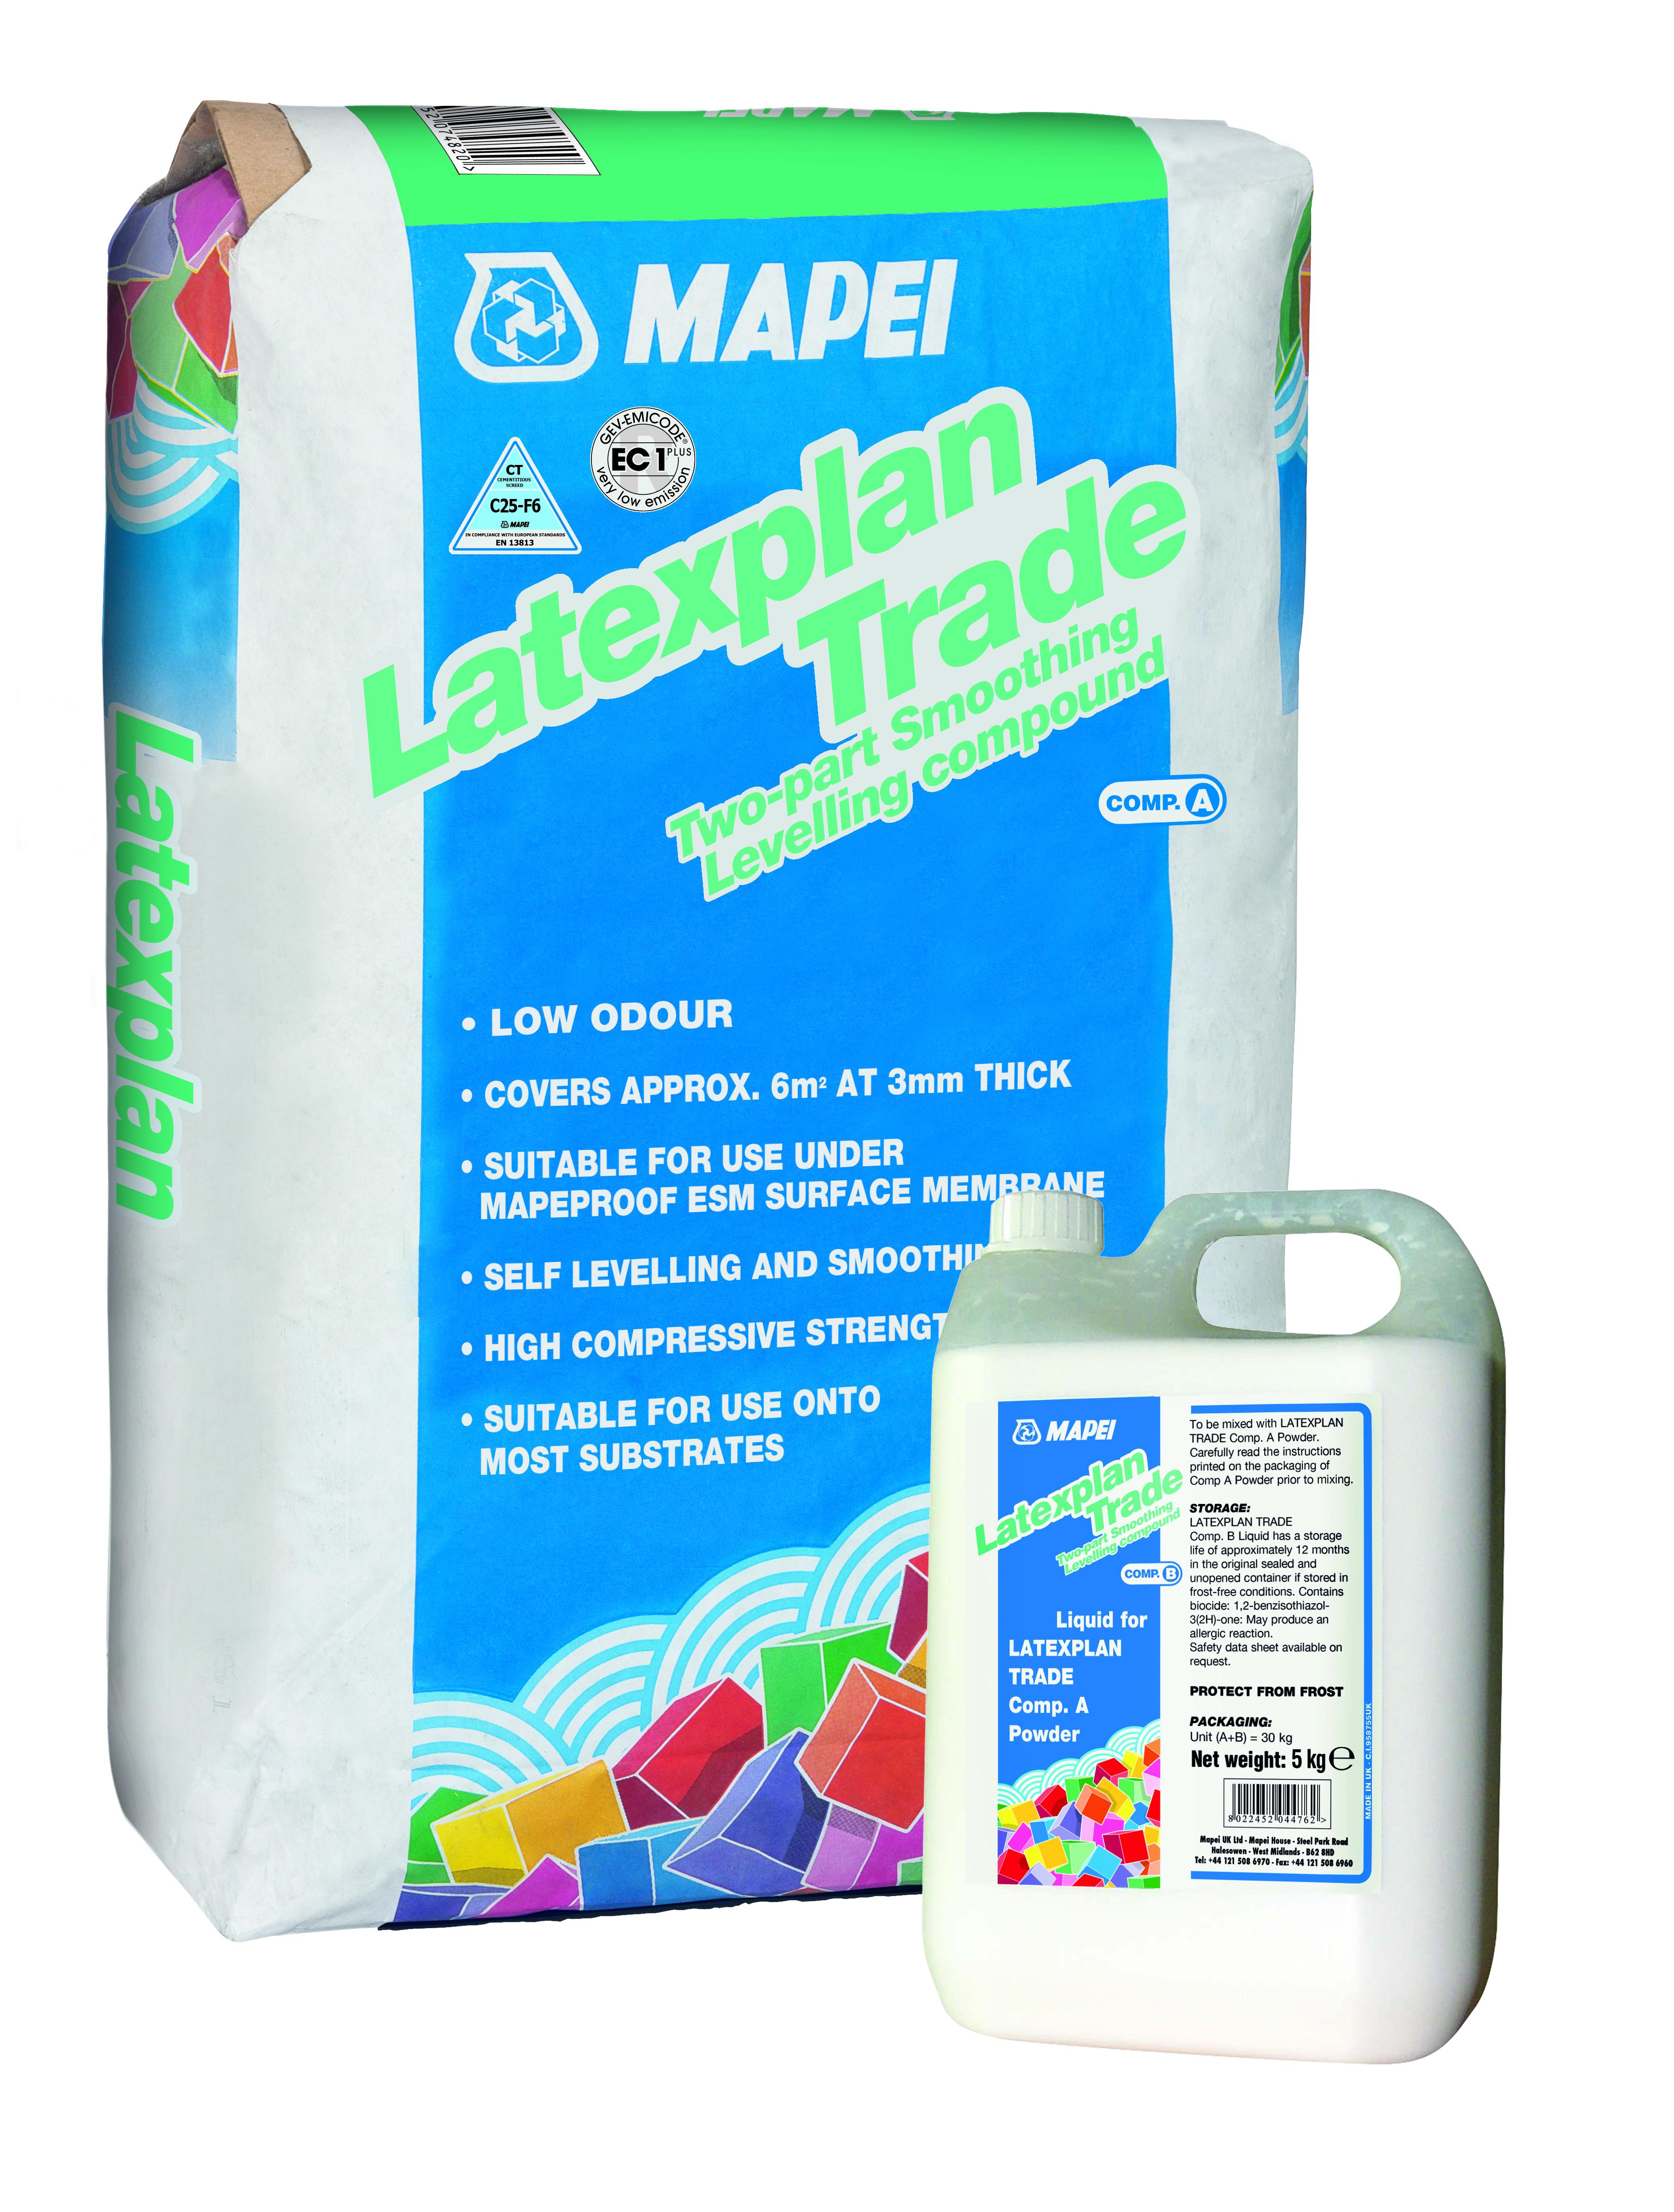 Mapei Latexplan Trade